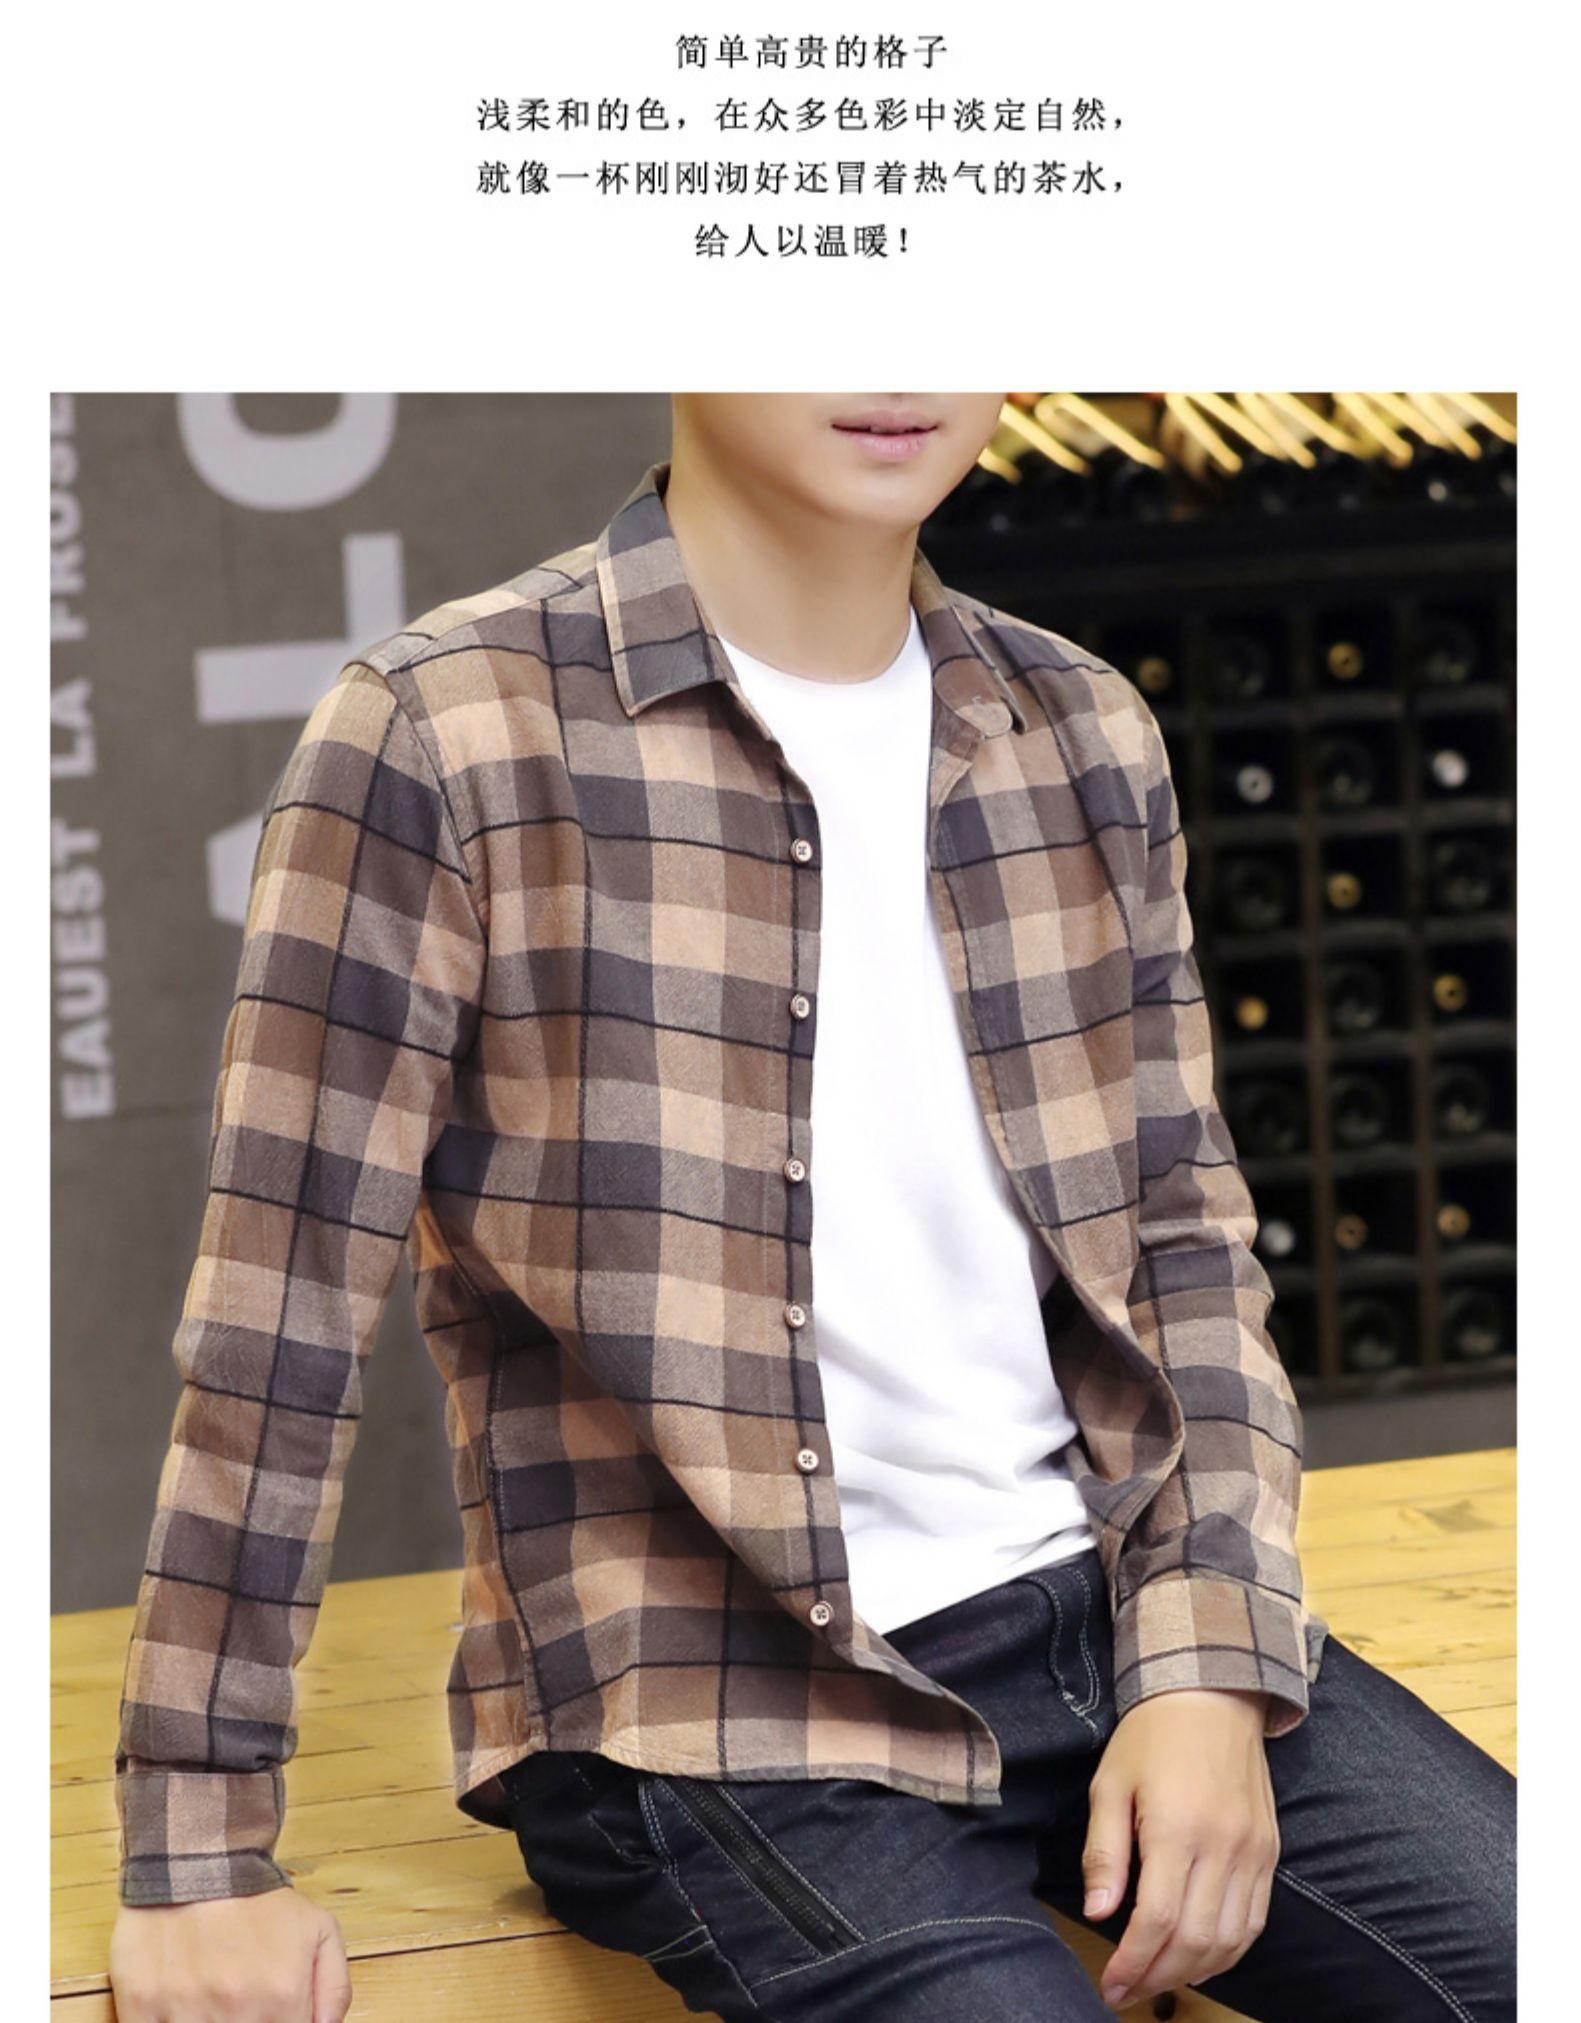 Autumn pure cotton lad shirt men's Korean version of the trend autumn fashion slim long-sleeved shirt men's handsome jacket 59 Online shopping Bangladesh